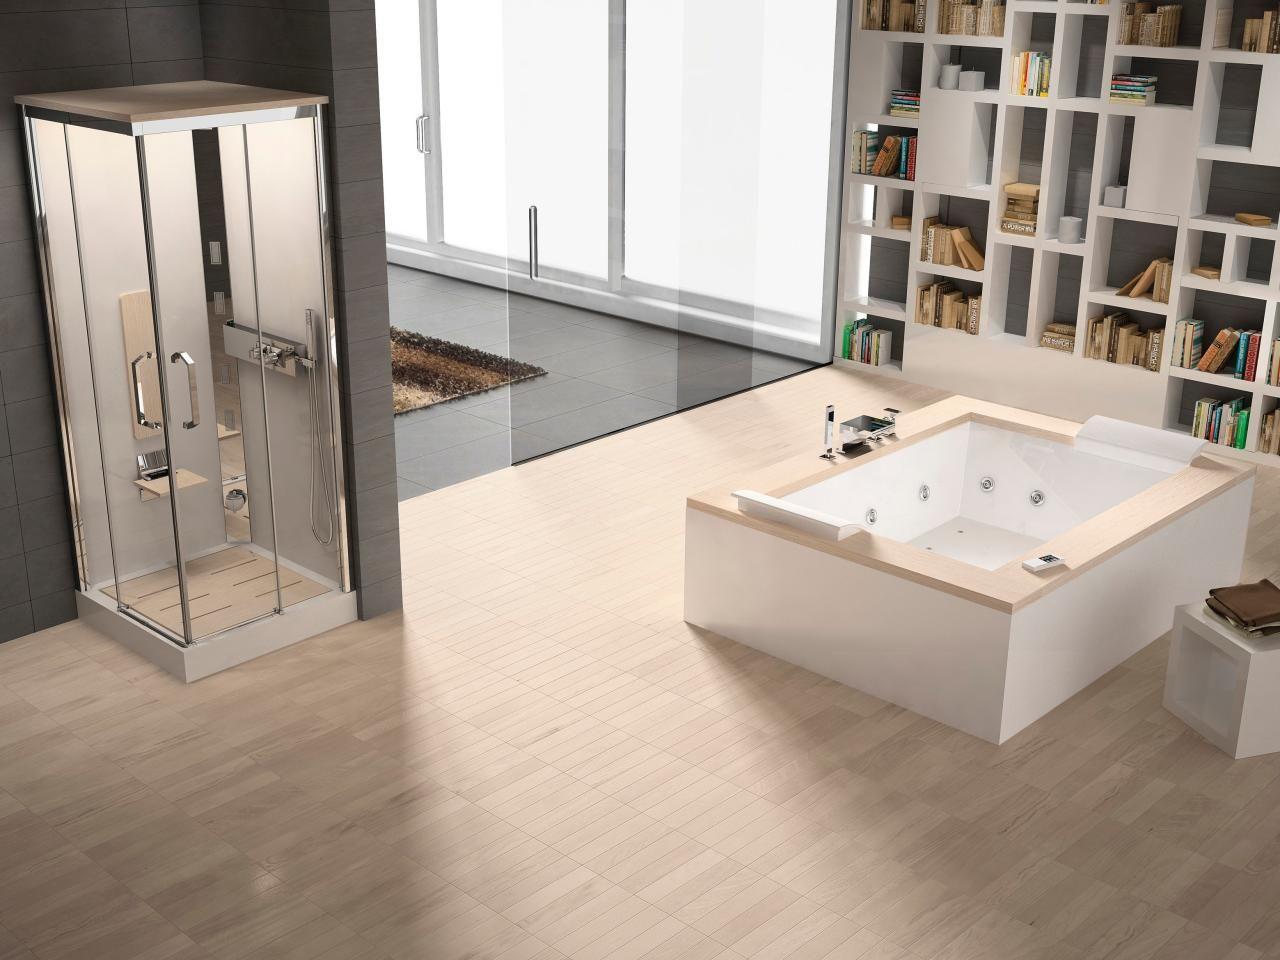 How to Choose a Bathtub | Bathtubs, Hgtv and Bath remodel